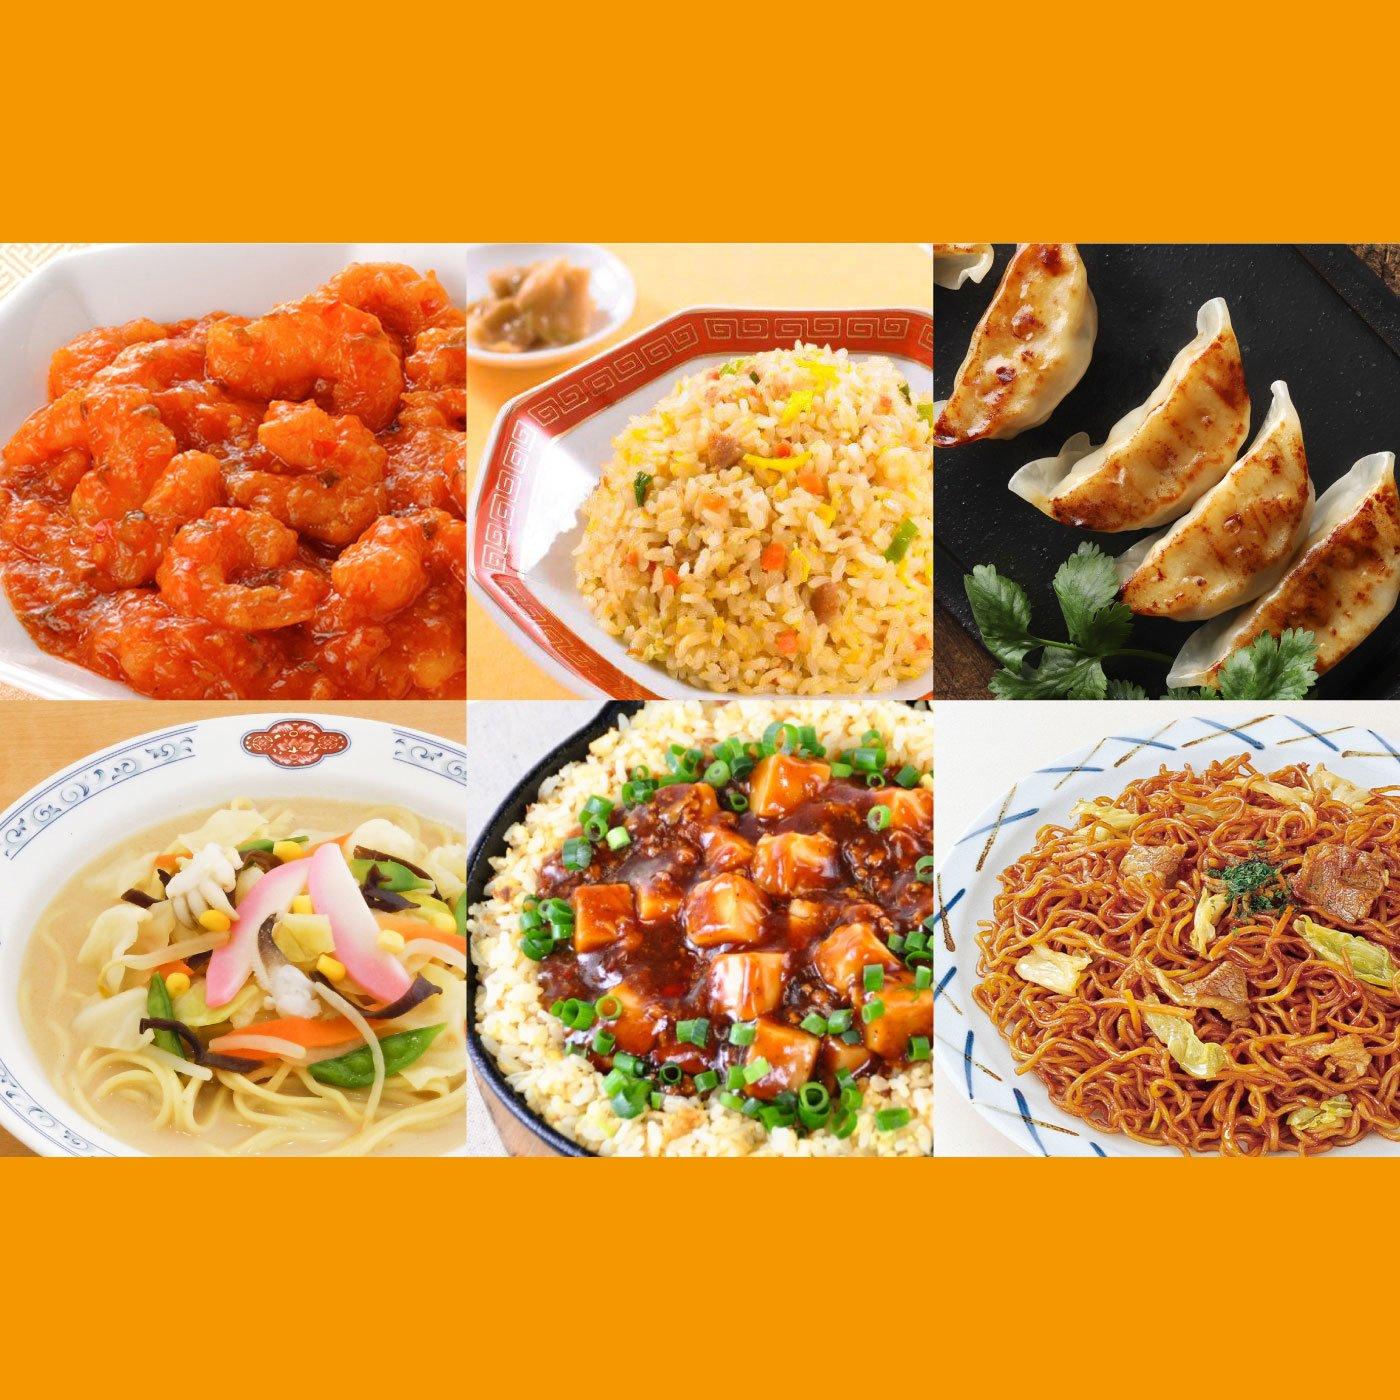 家食応援 冷凍惣菜 定番中華6種セット